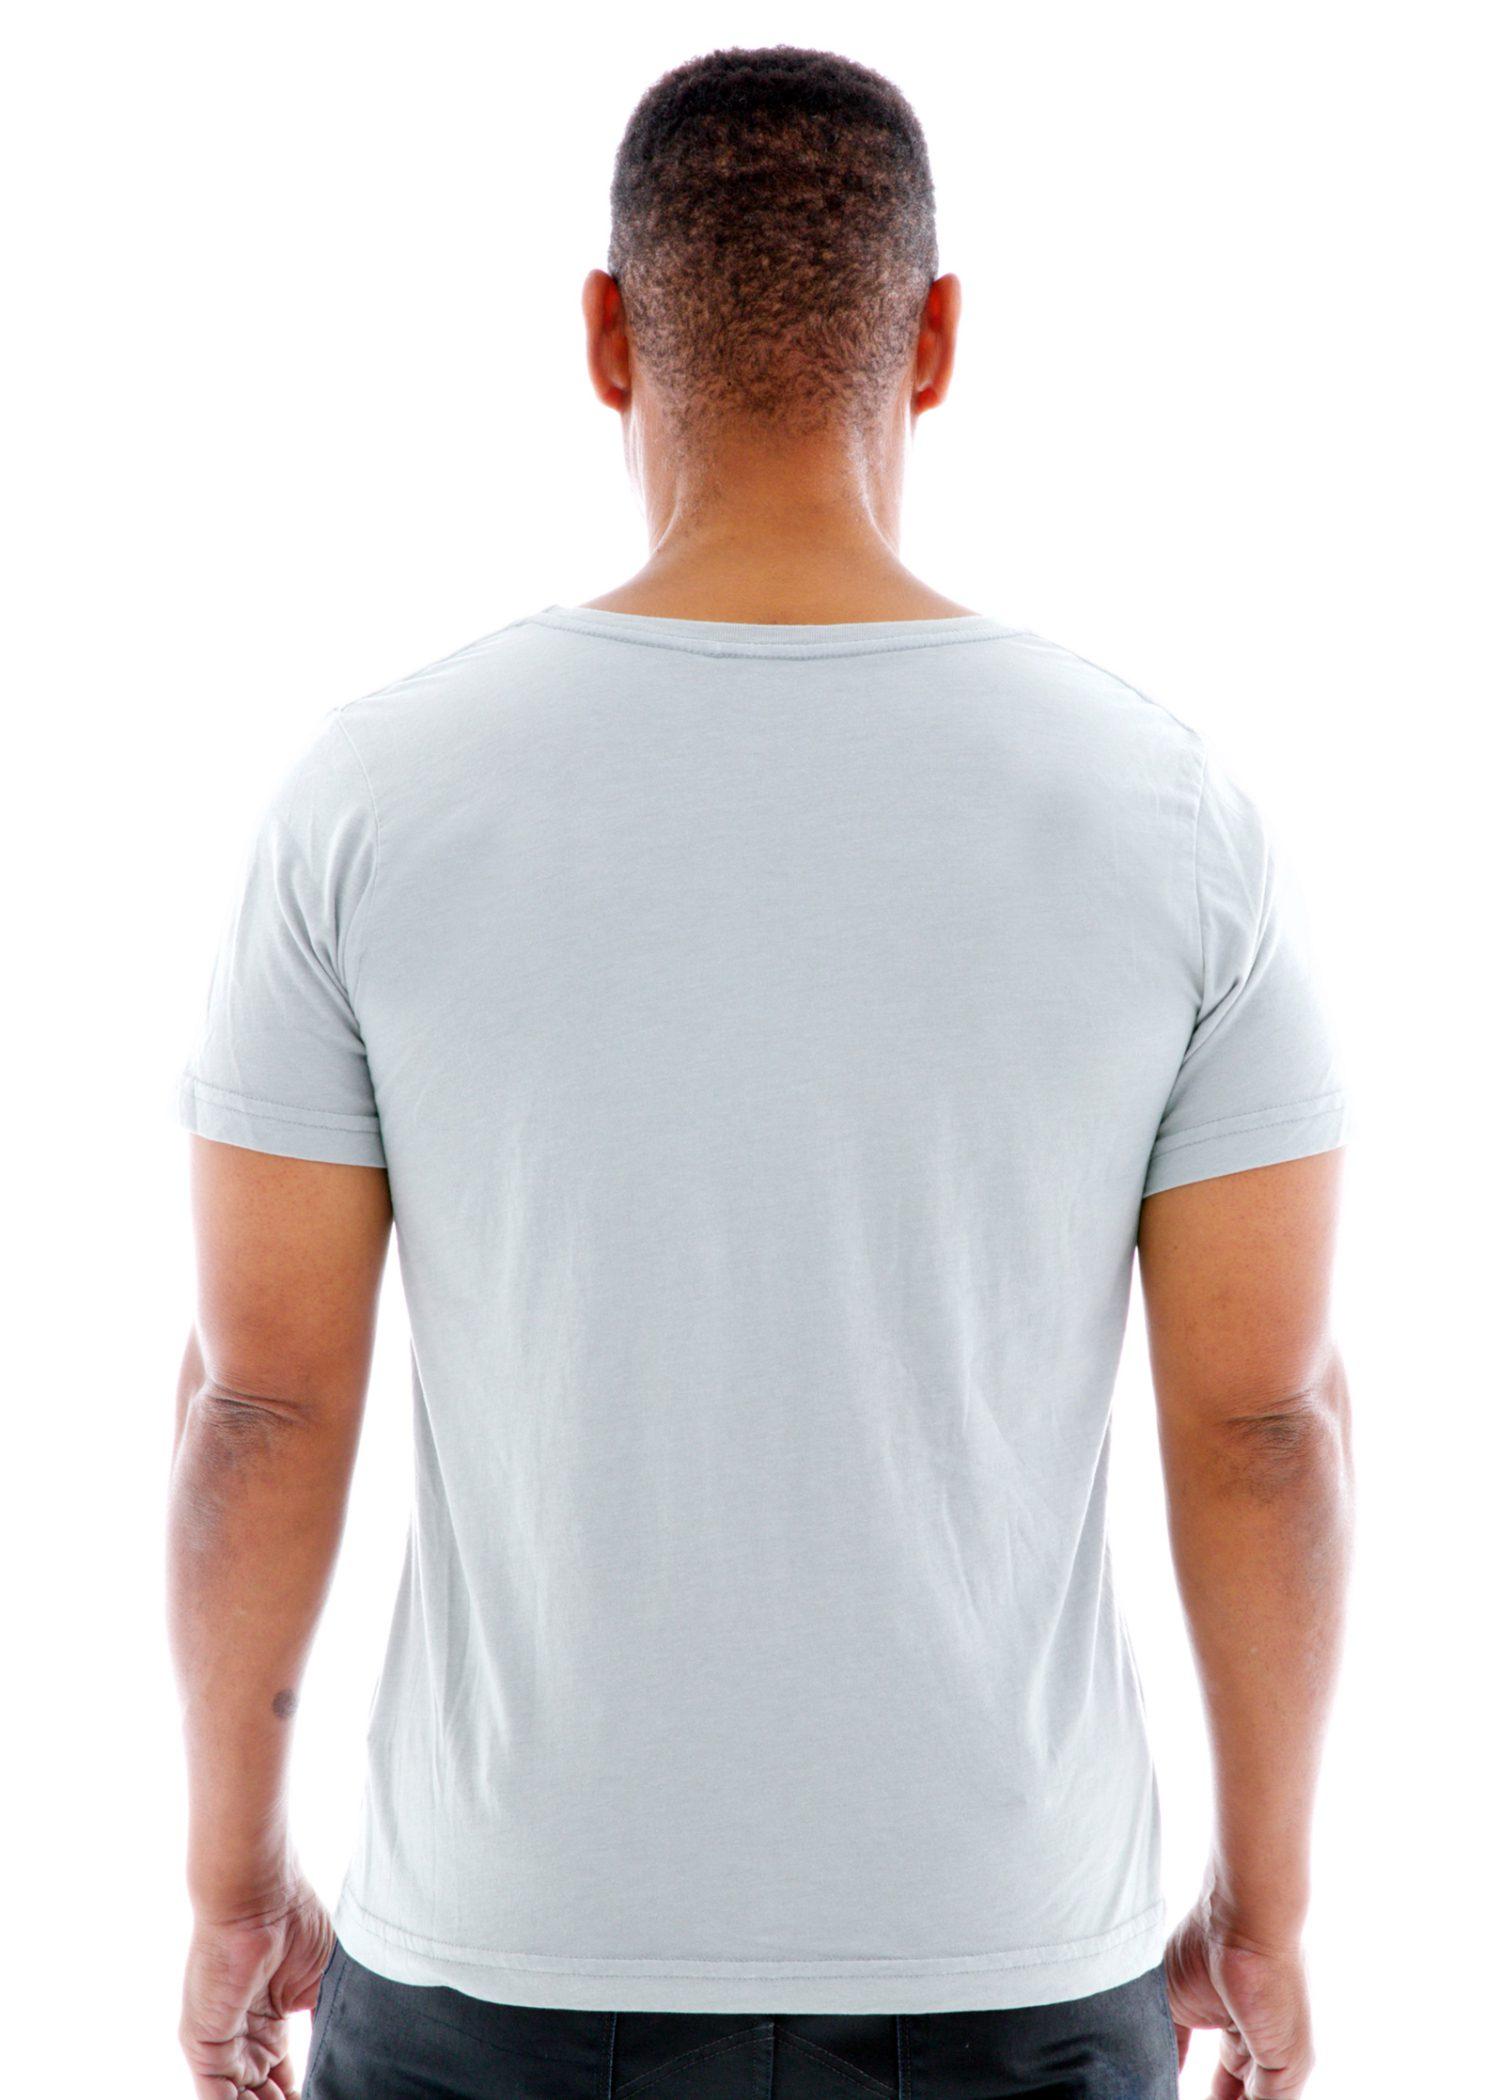 Superfine Jersey Fashion Crew Short Sleeve T-Shirt Back View